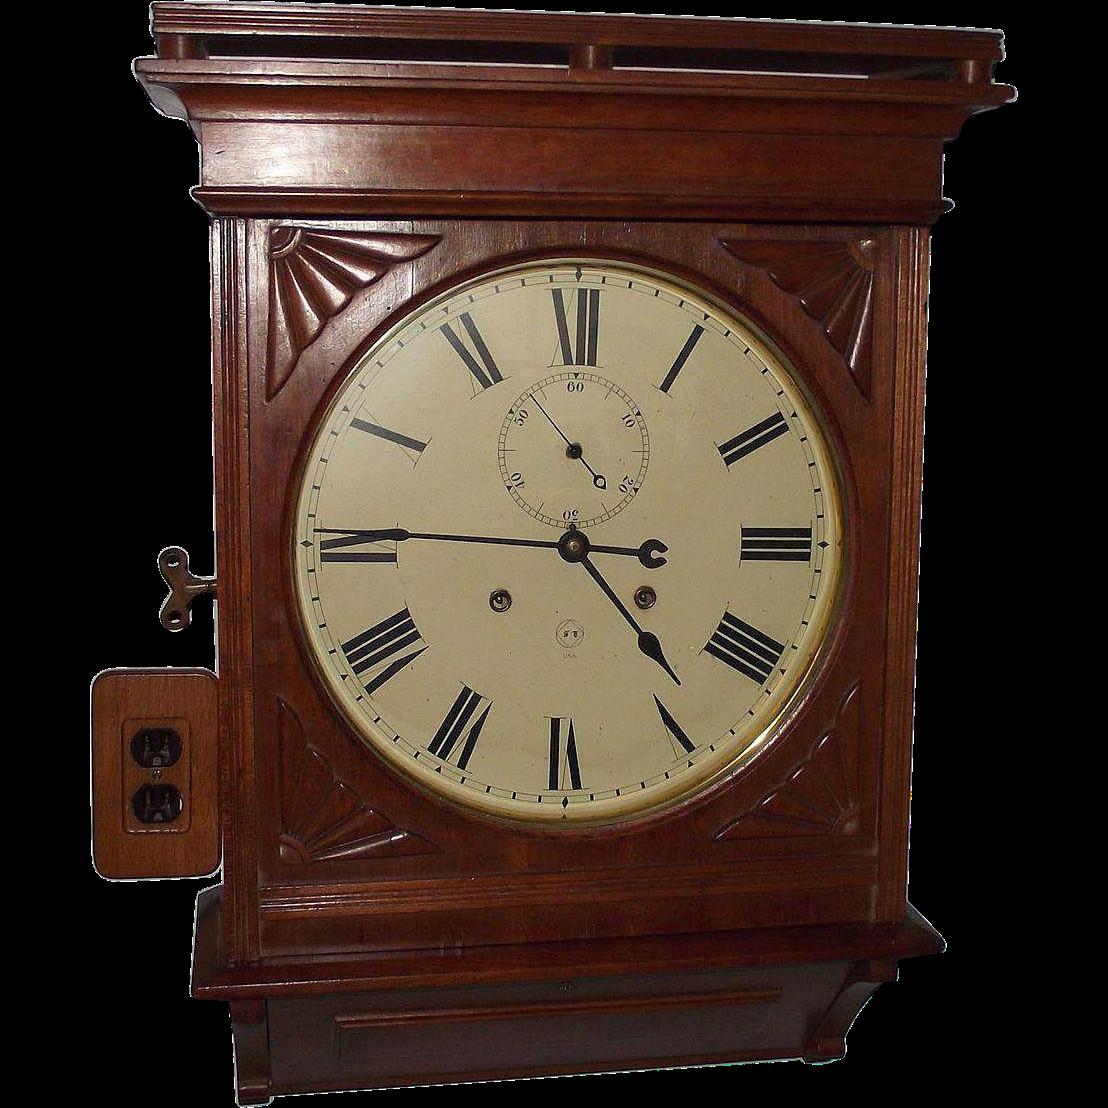 Rare cherry lobby model seth thomas 14 inch dial clock with 2 rare cherry lobby model seth thomas 14 inch dial clock with 2 key 30 day double key wind in an early 1890 case amipublicfo Choice Image